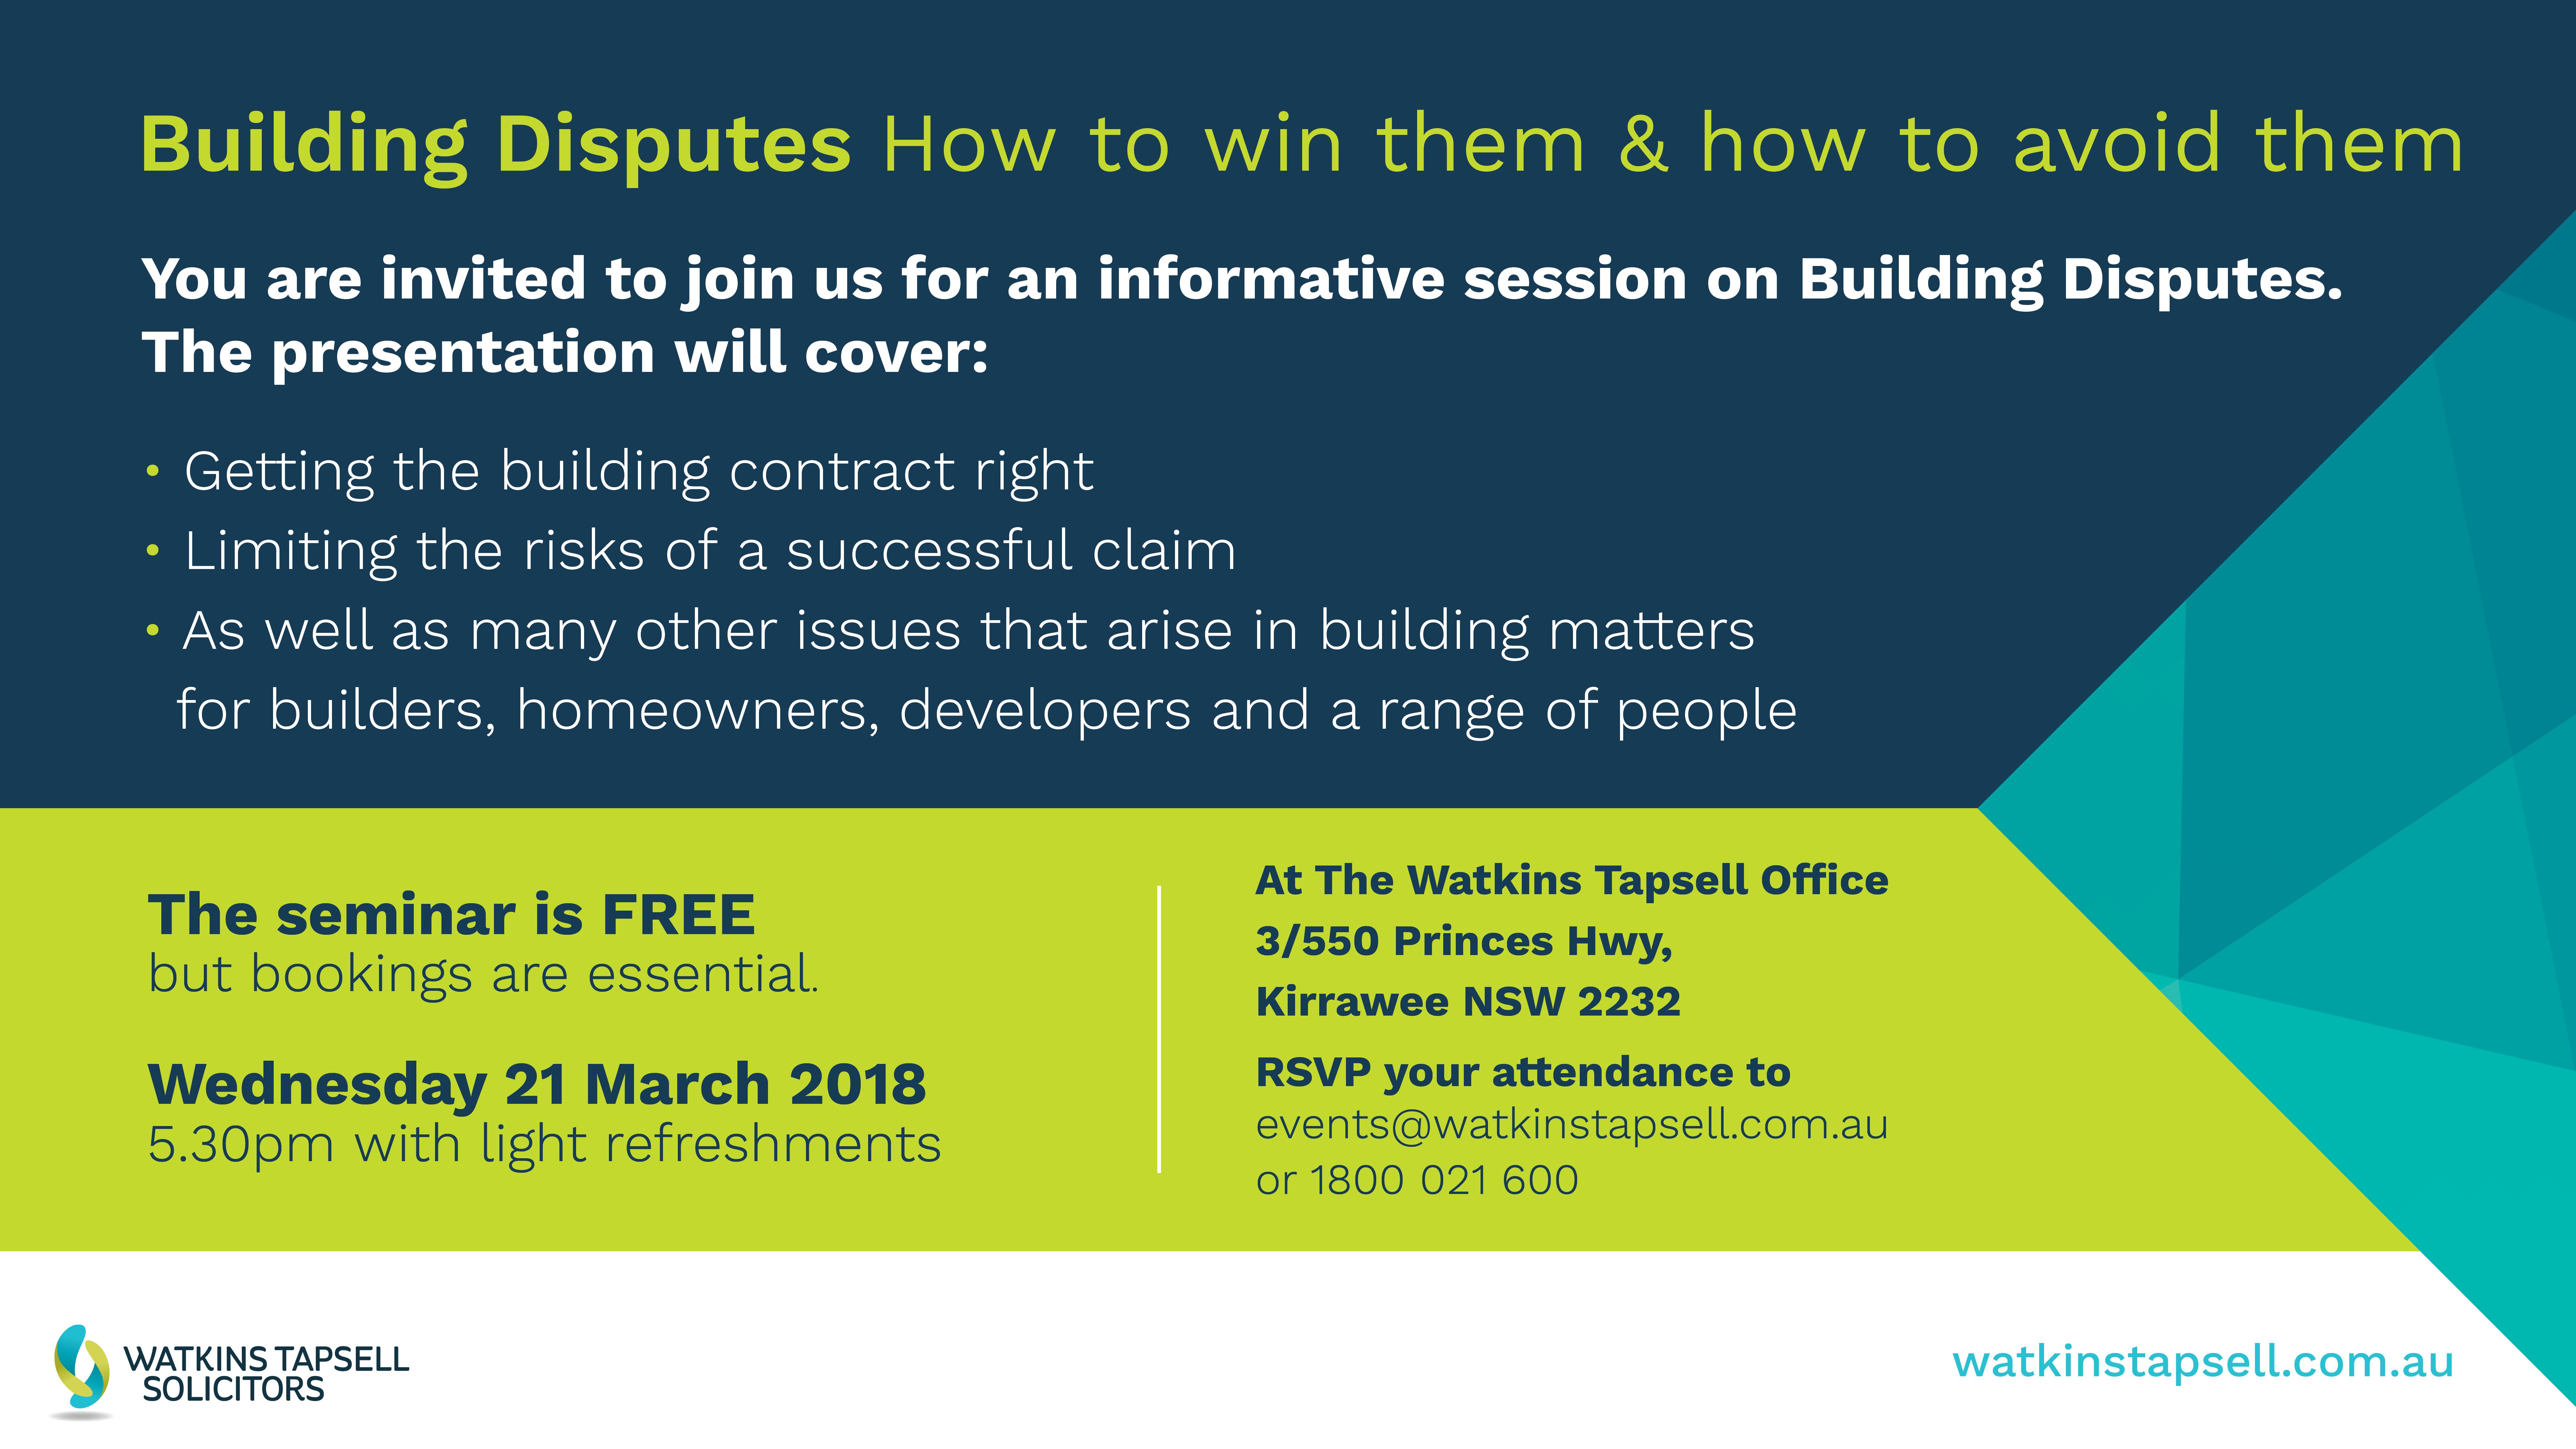 Building Disputes Information Session